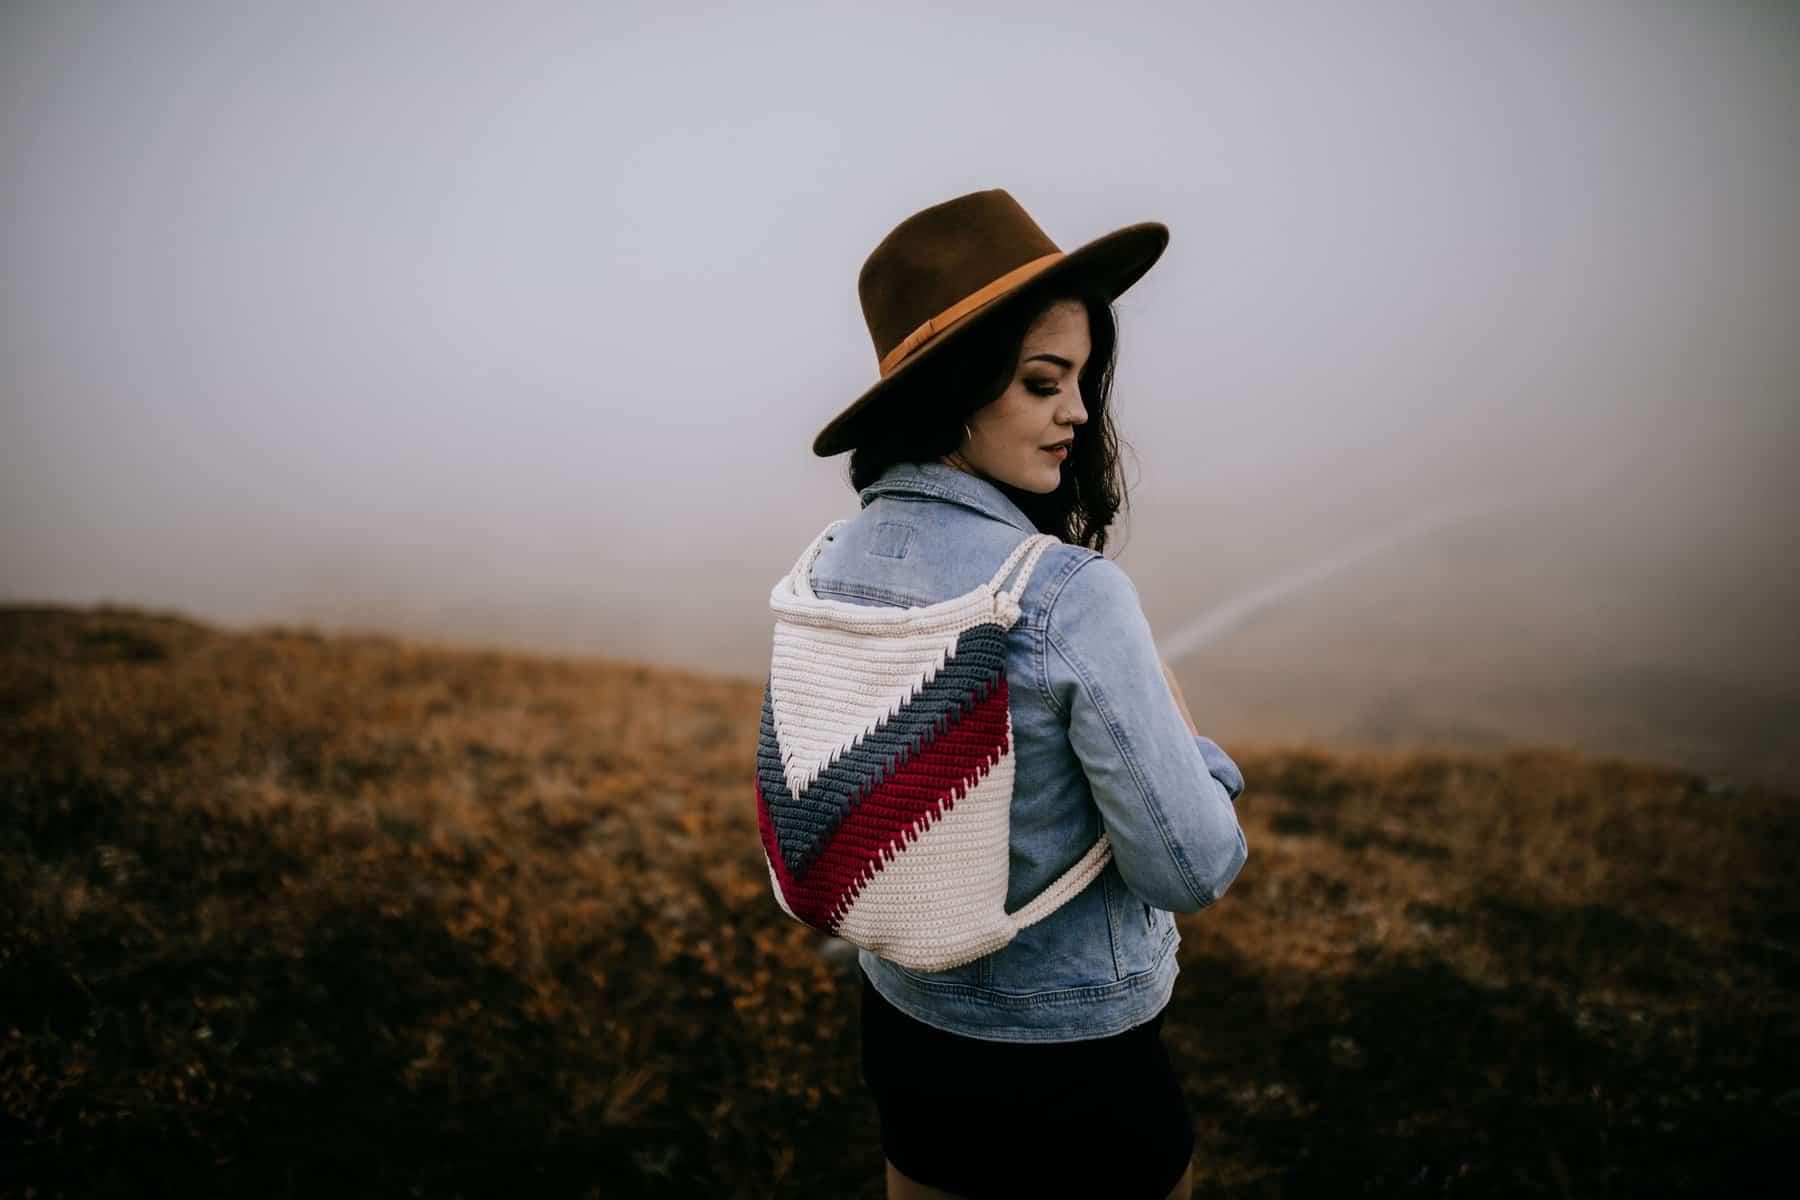 Wanderlust Crochet Backpack - Free Crochet Backpack Pattern by A Crocheted Simplicity #crochetbag #crochetbackpack #crochetchevron #chevronbackpack #handmadebackpack #freecrochetpattern #crochetbackpackpattern #chevron #spikestitch #crochetspikestitch